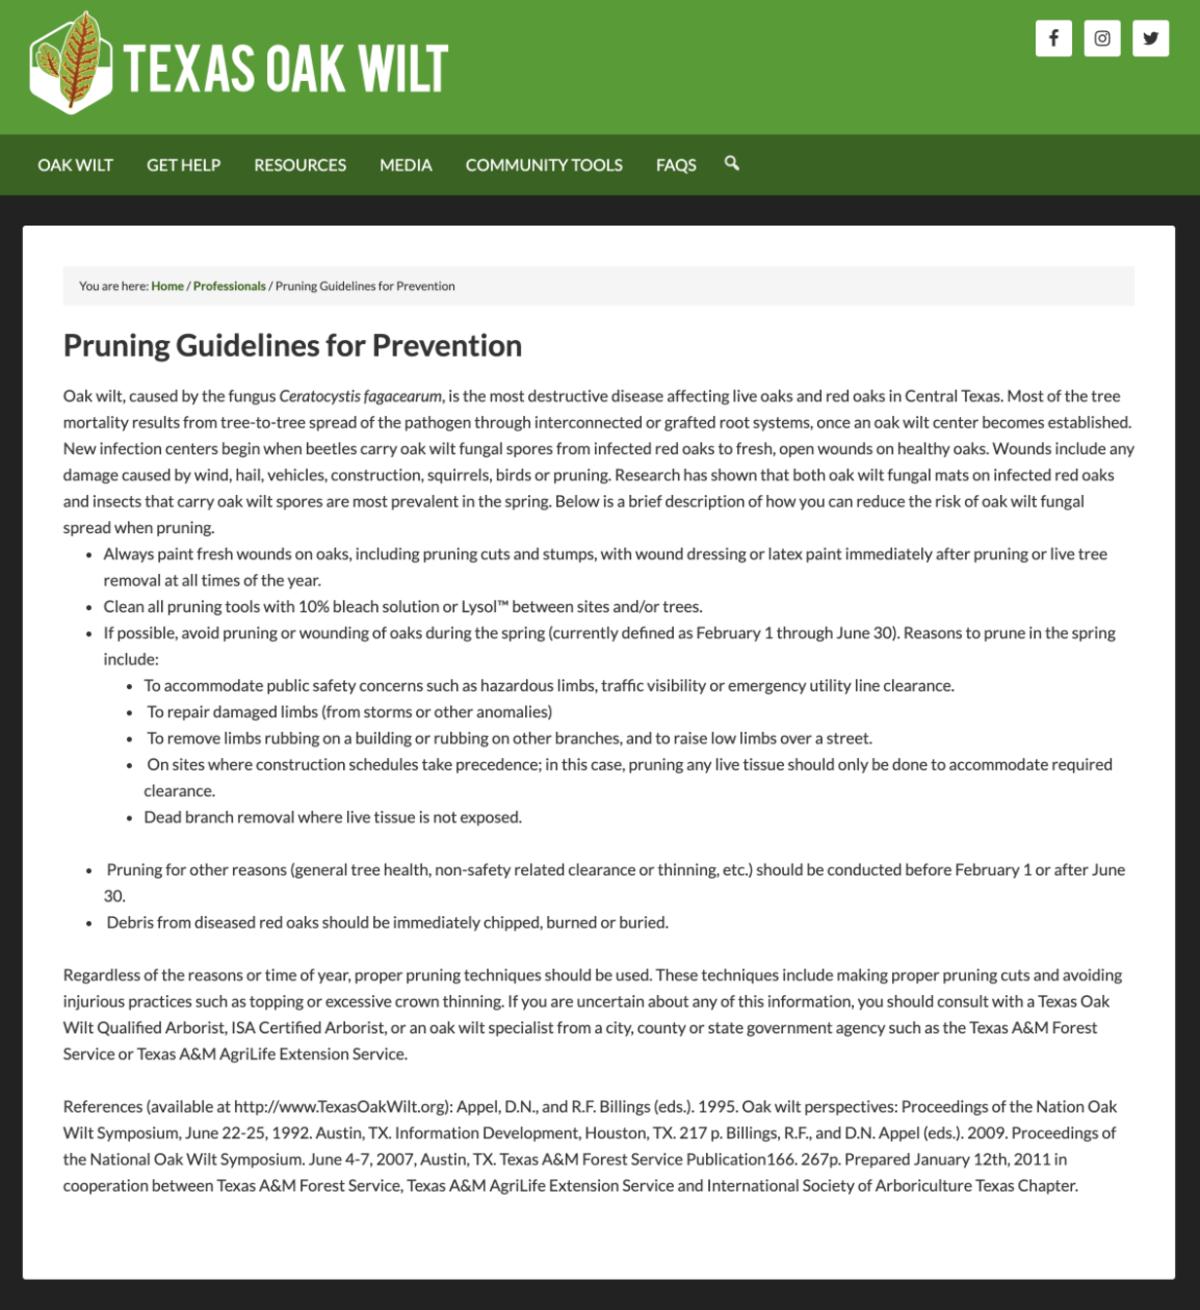 Texas Oak Wilt Pruning Guidelines